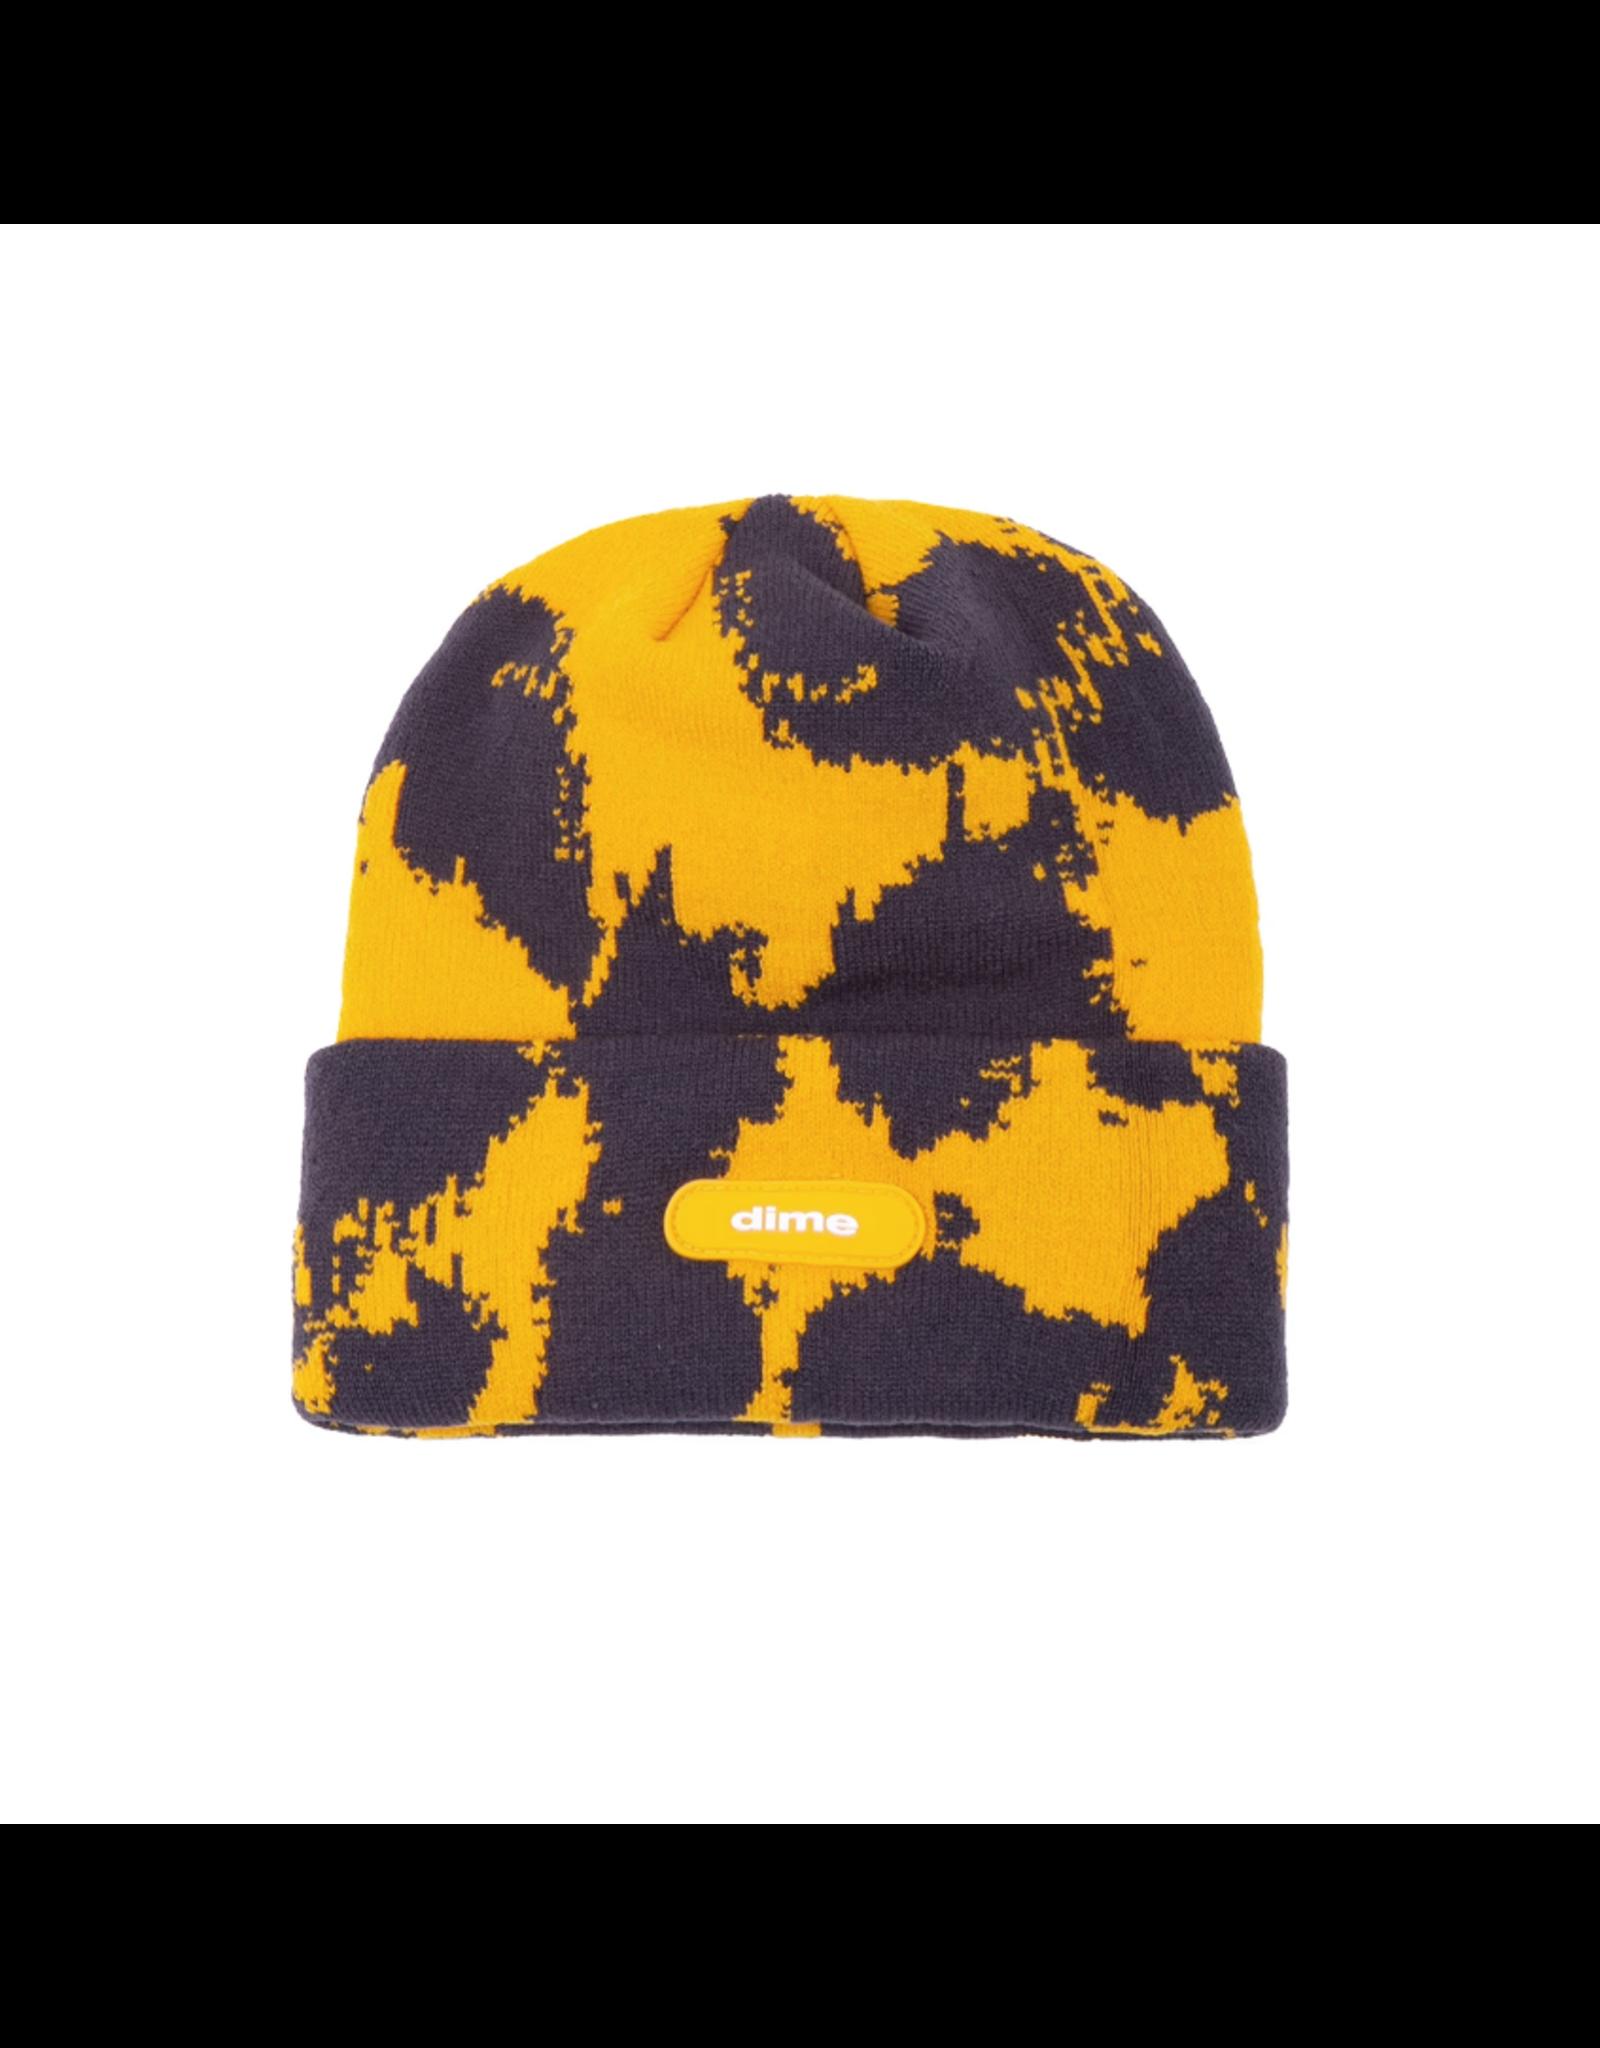 Dime Sly Beanie - Yellow